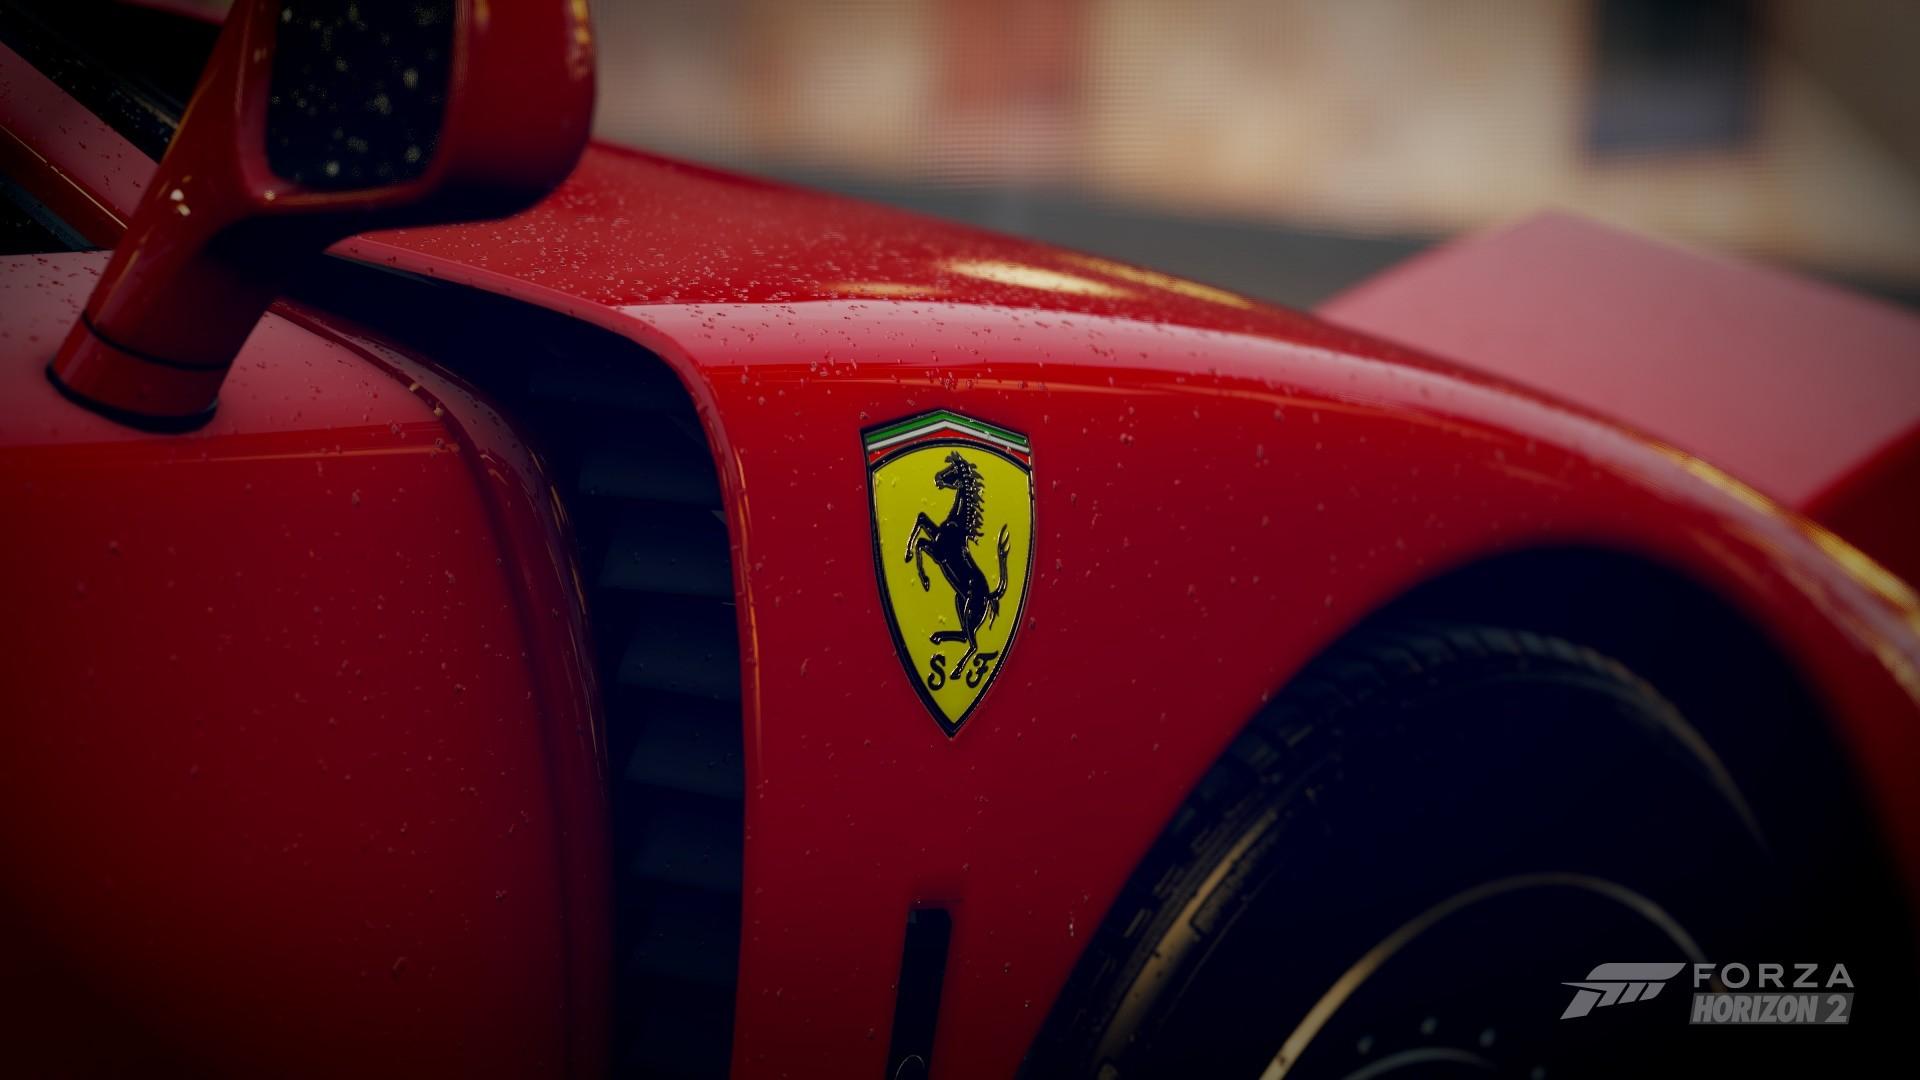 Wallpaper 1920x1080 Px Car Ferrari F40 Forza Horizon 2 Red